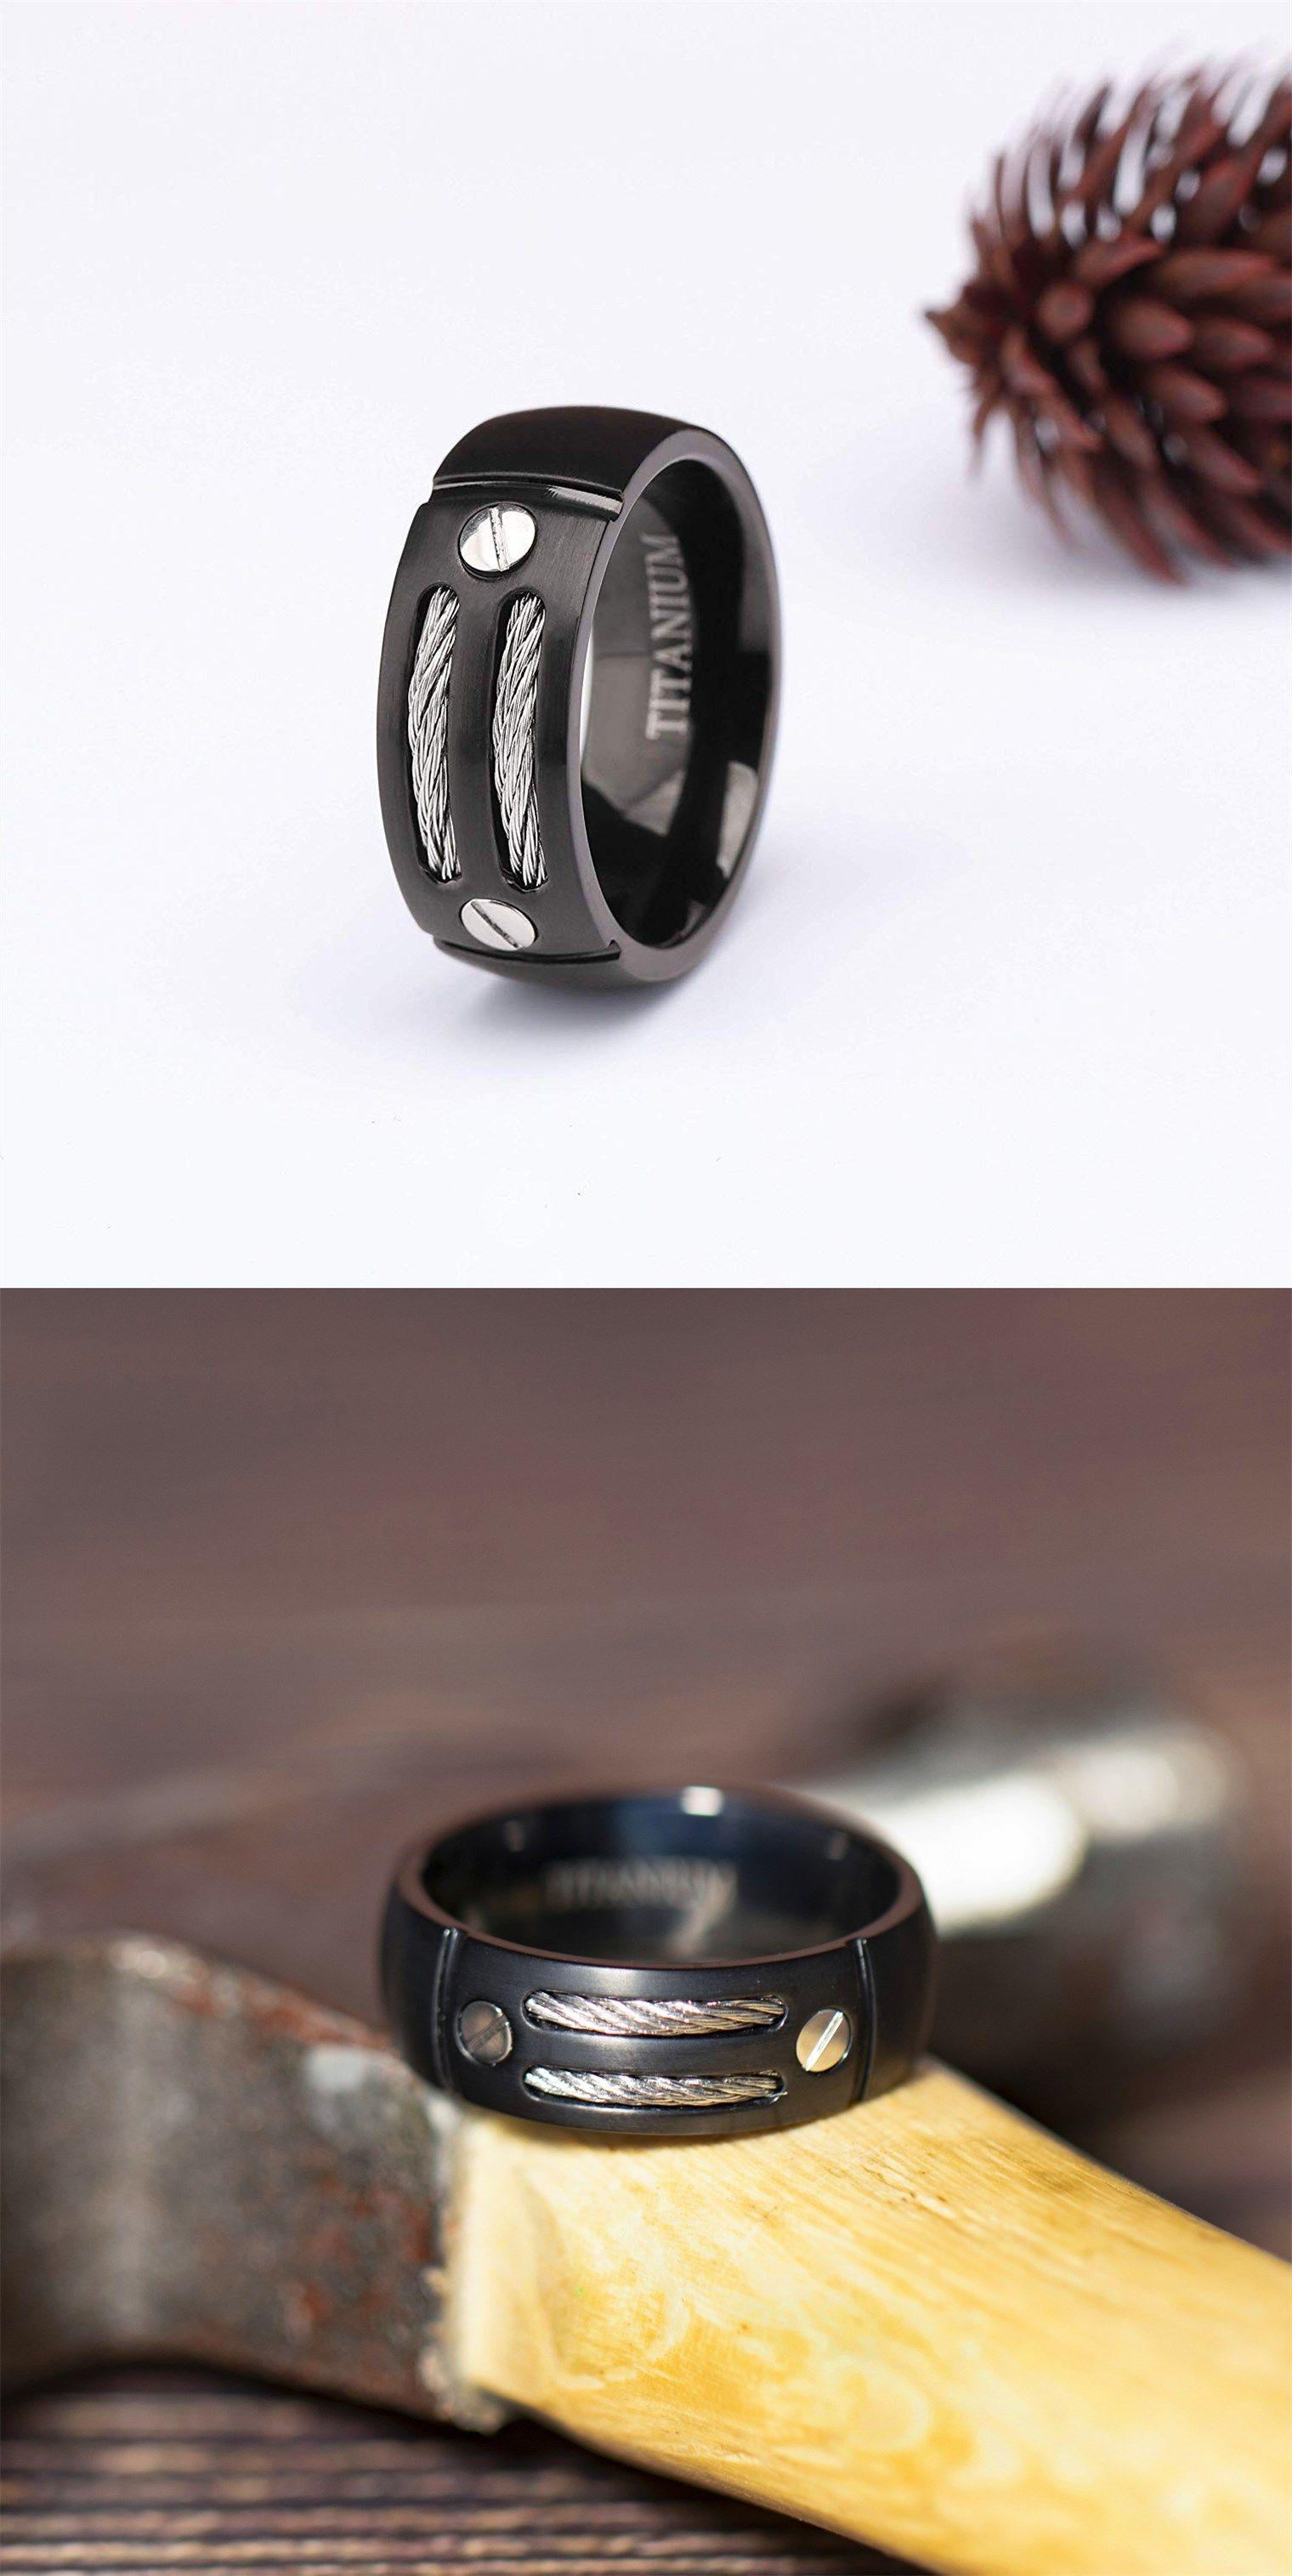 Black Titanium Cable Rings Mens Fashion Rings Comfort Fit Silver Ring Designs Mens Rings Fashion Mens Ring Designs